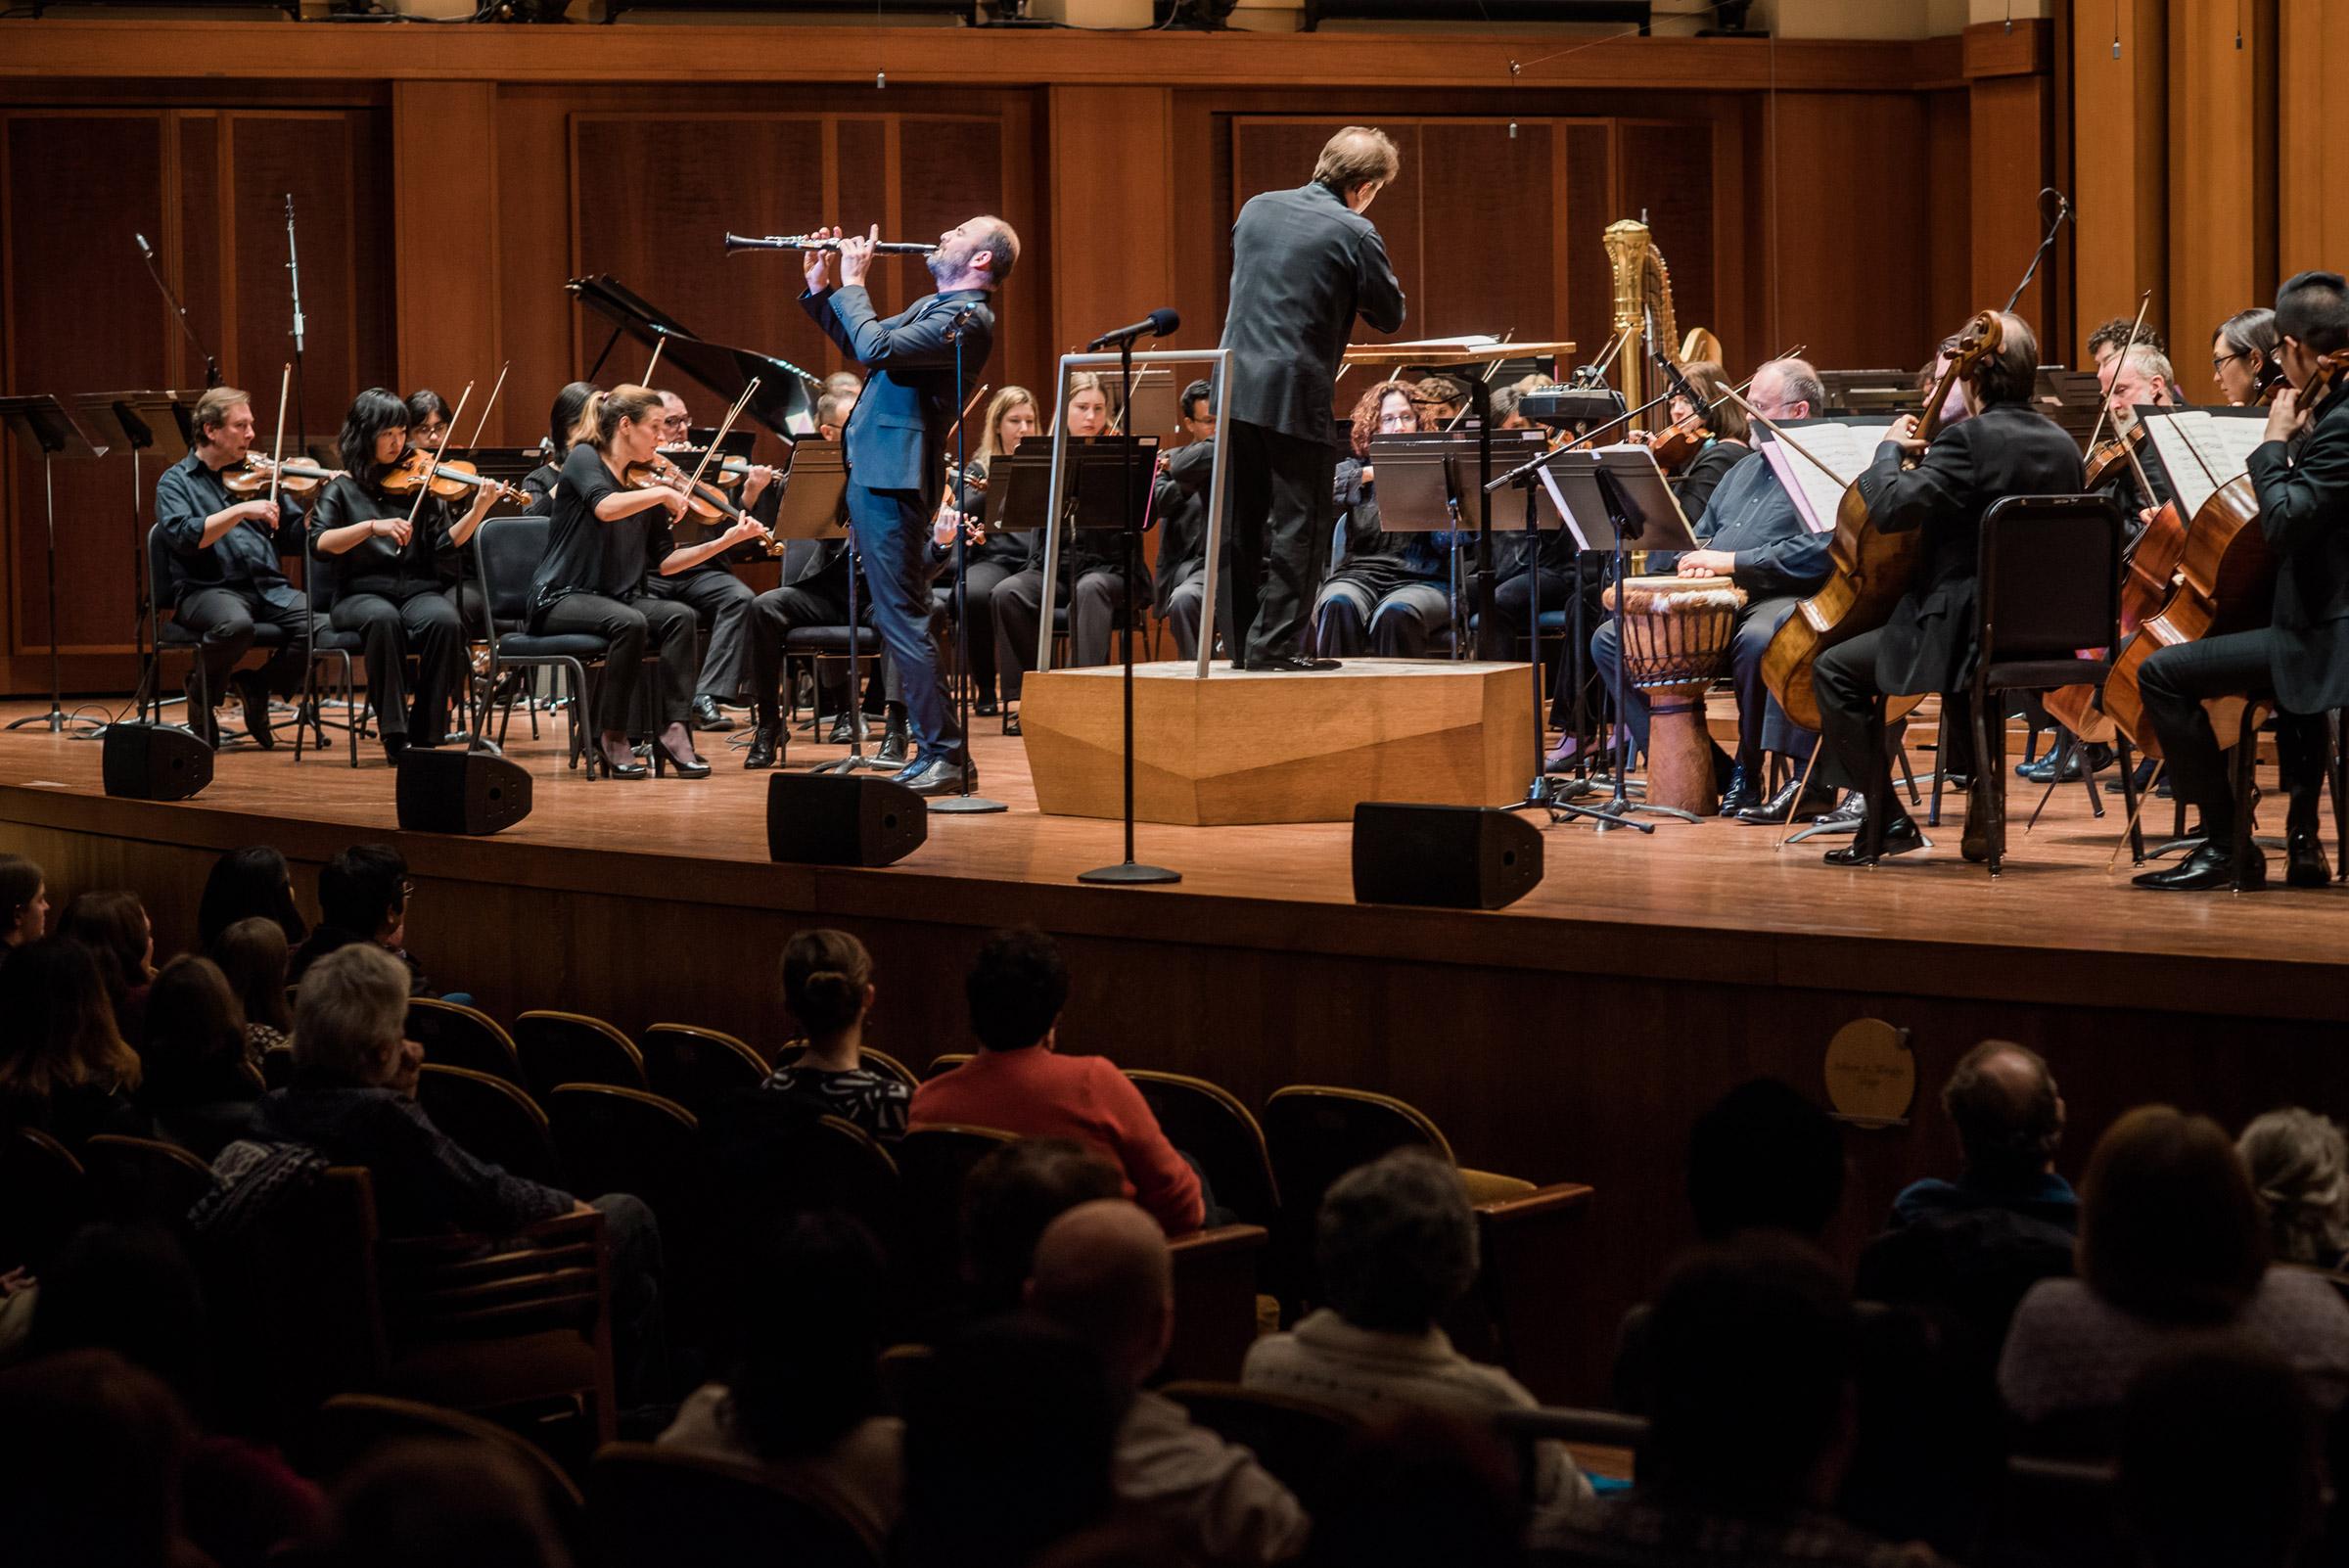 seattle-symphony-orchestra-brandon-patoc-kinan-azmeh-01.JPG